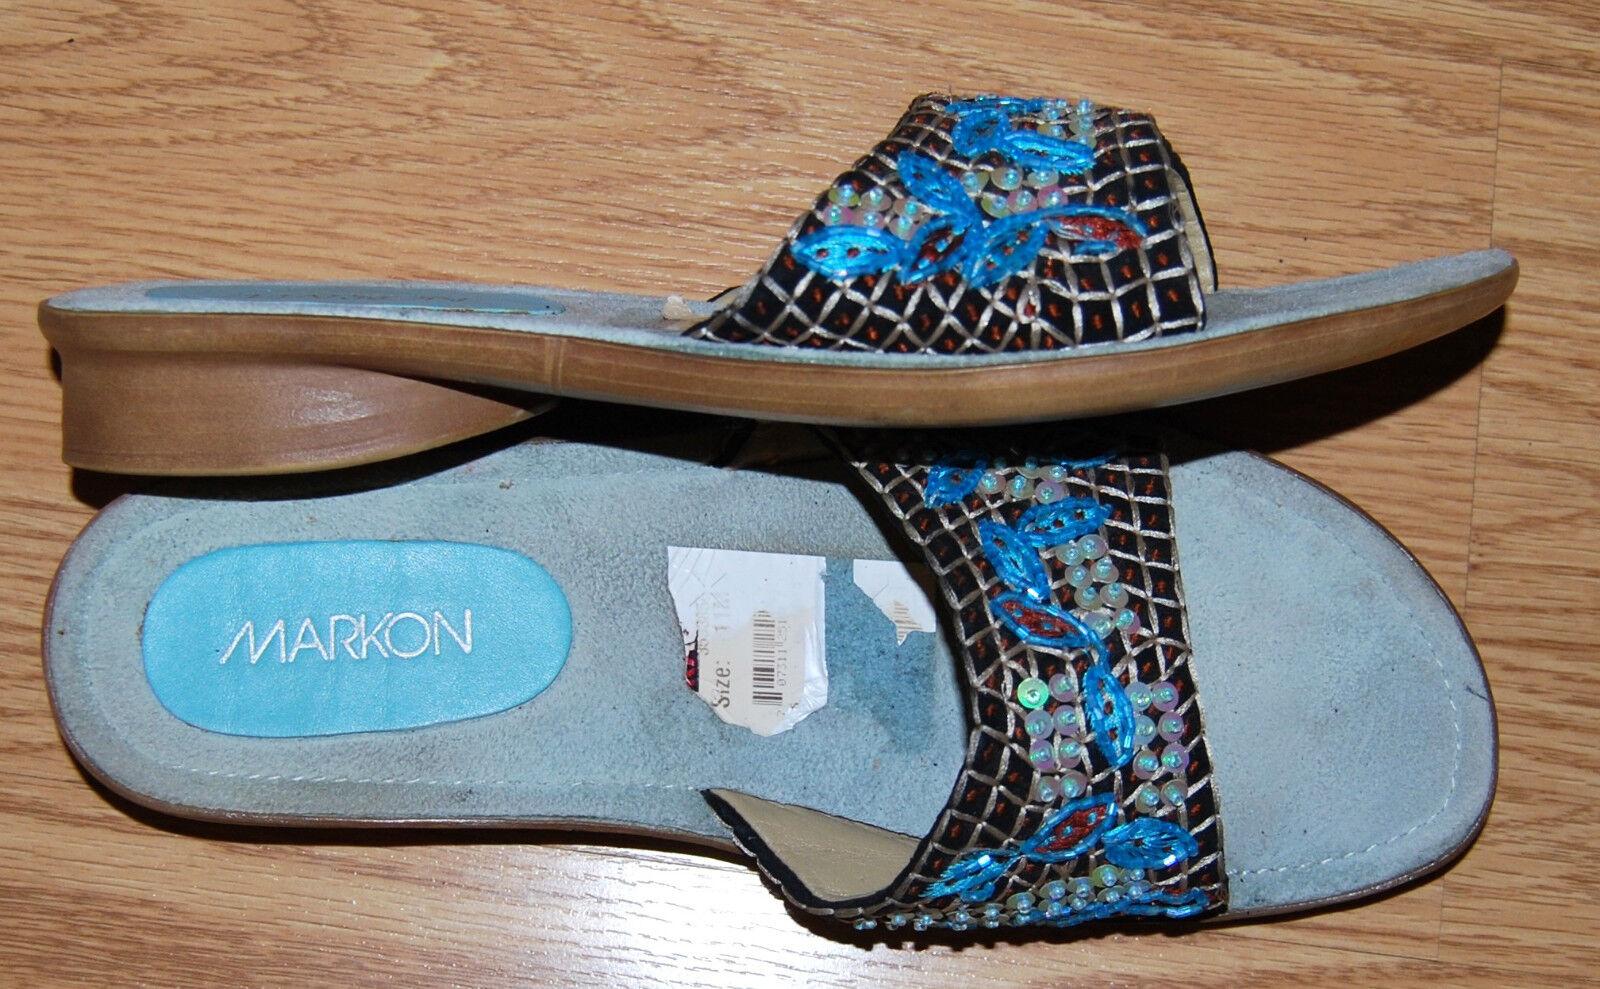 MARKON Aqua blue gold beaded flats sandals mules NEW block heels 11 embroidered NEW mules fa13c7